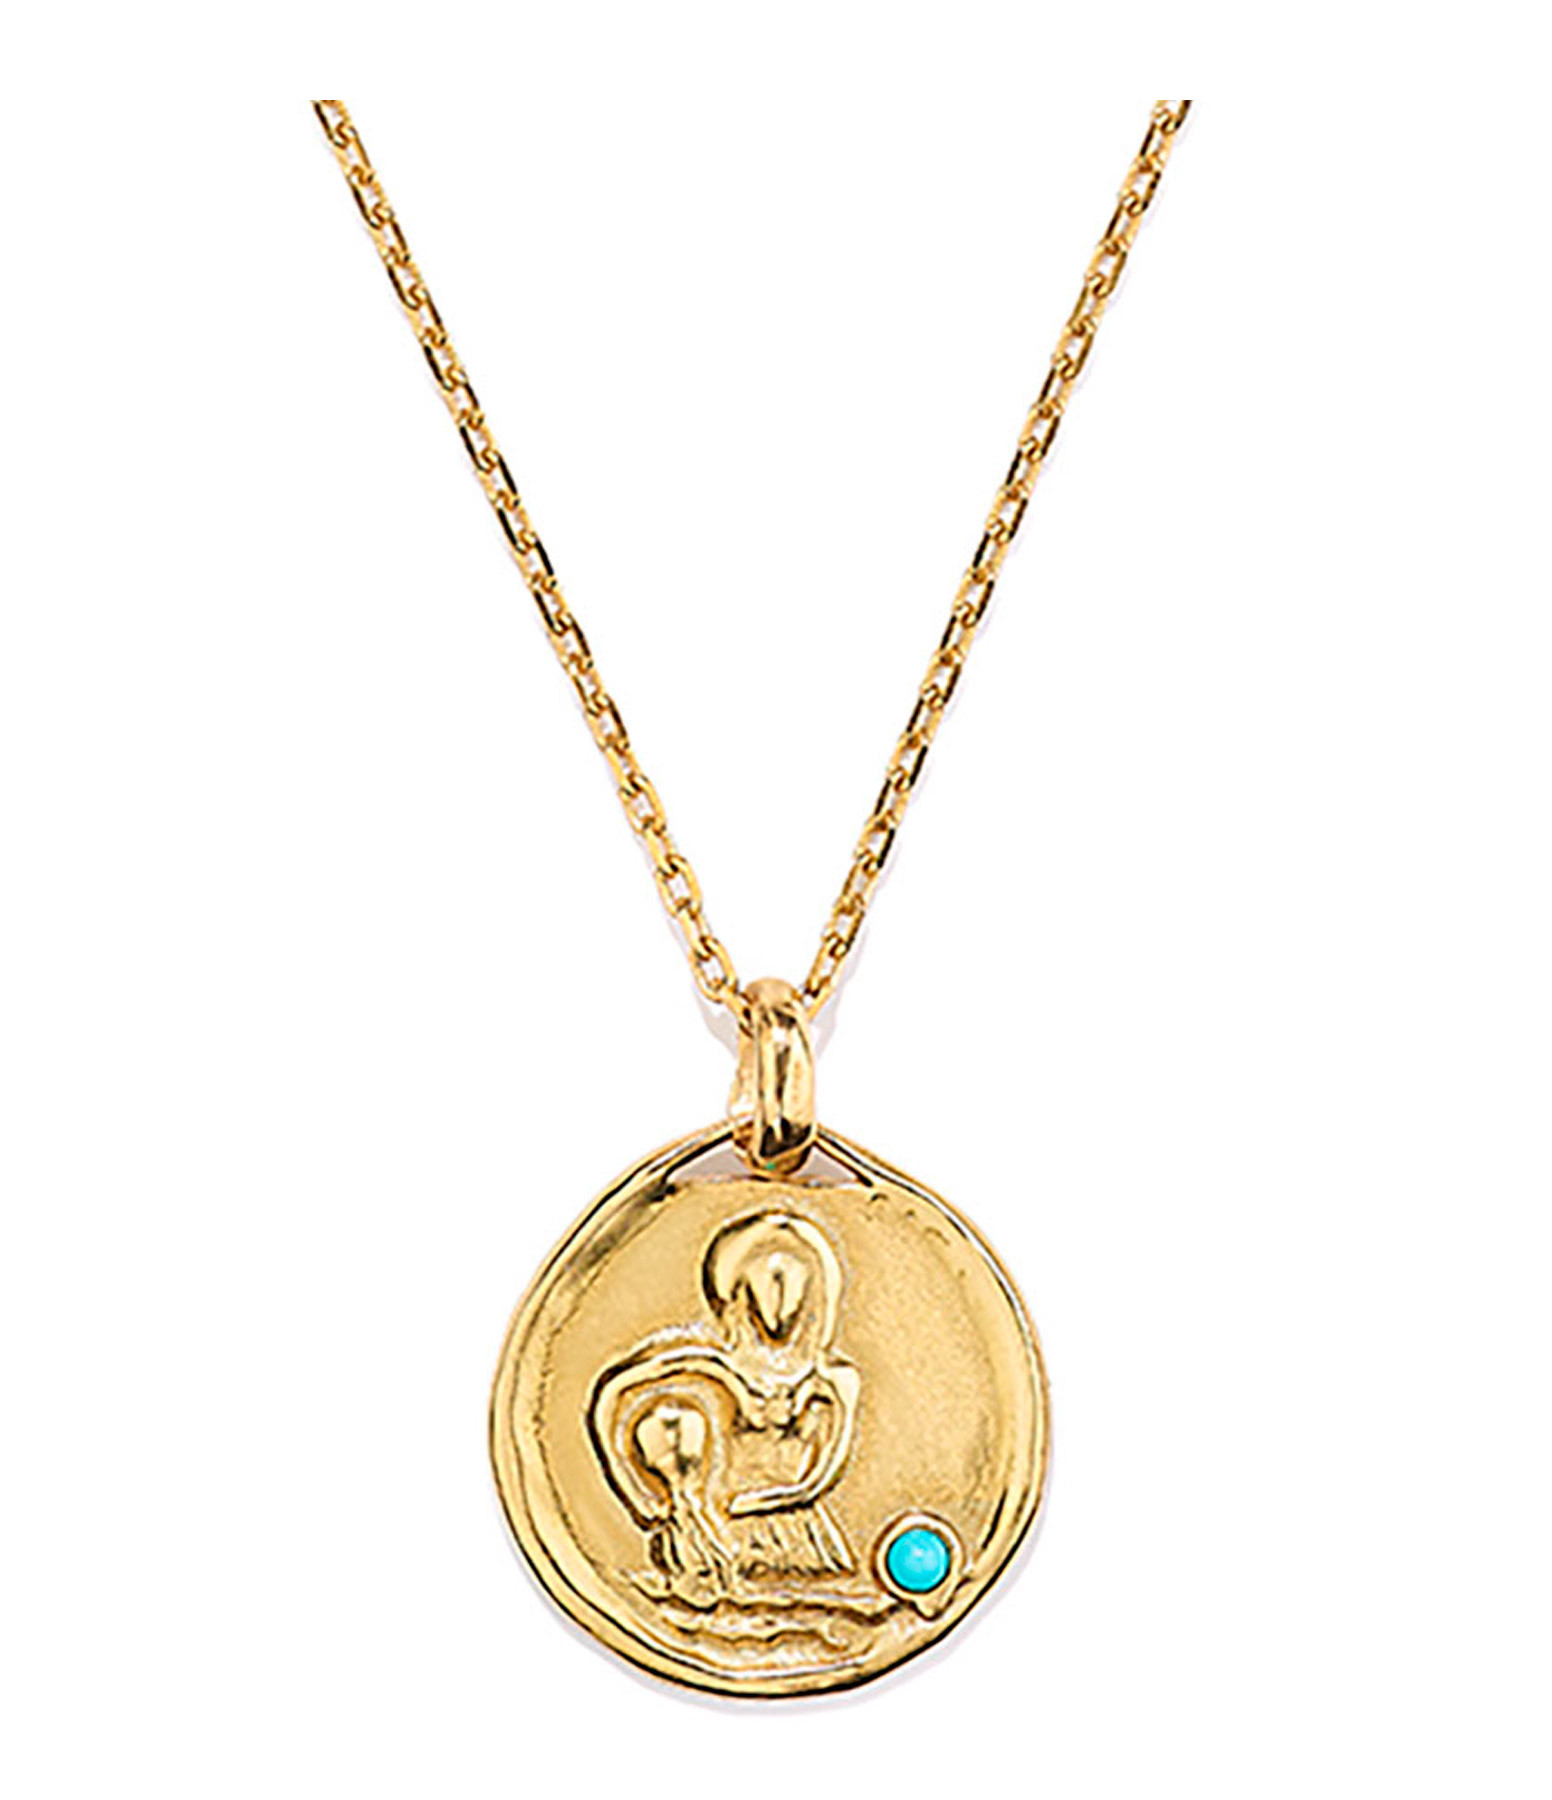 GOOSSENS - Collier Talisman Mini Astro Verseau Turquoise Plaqué Or